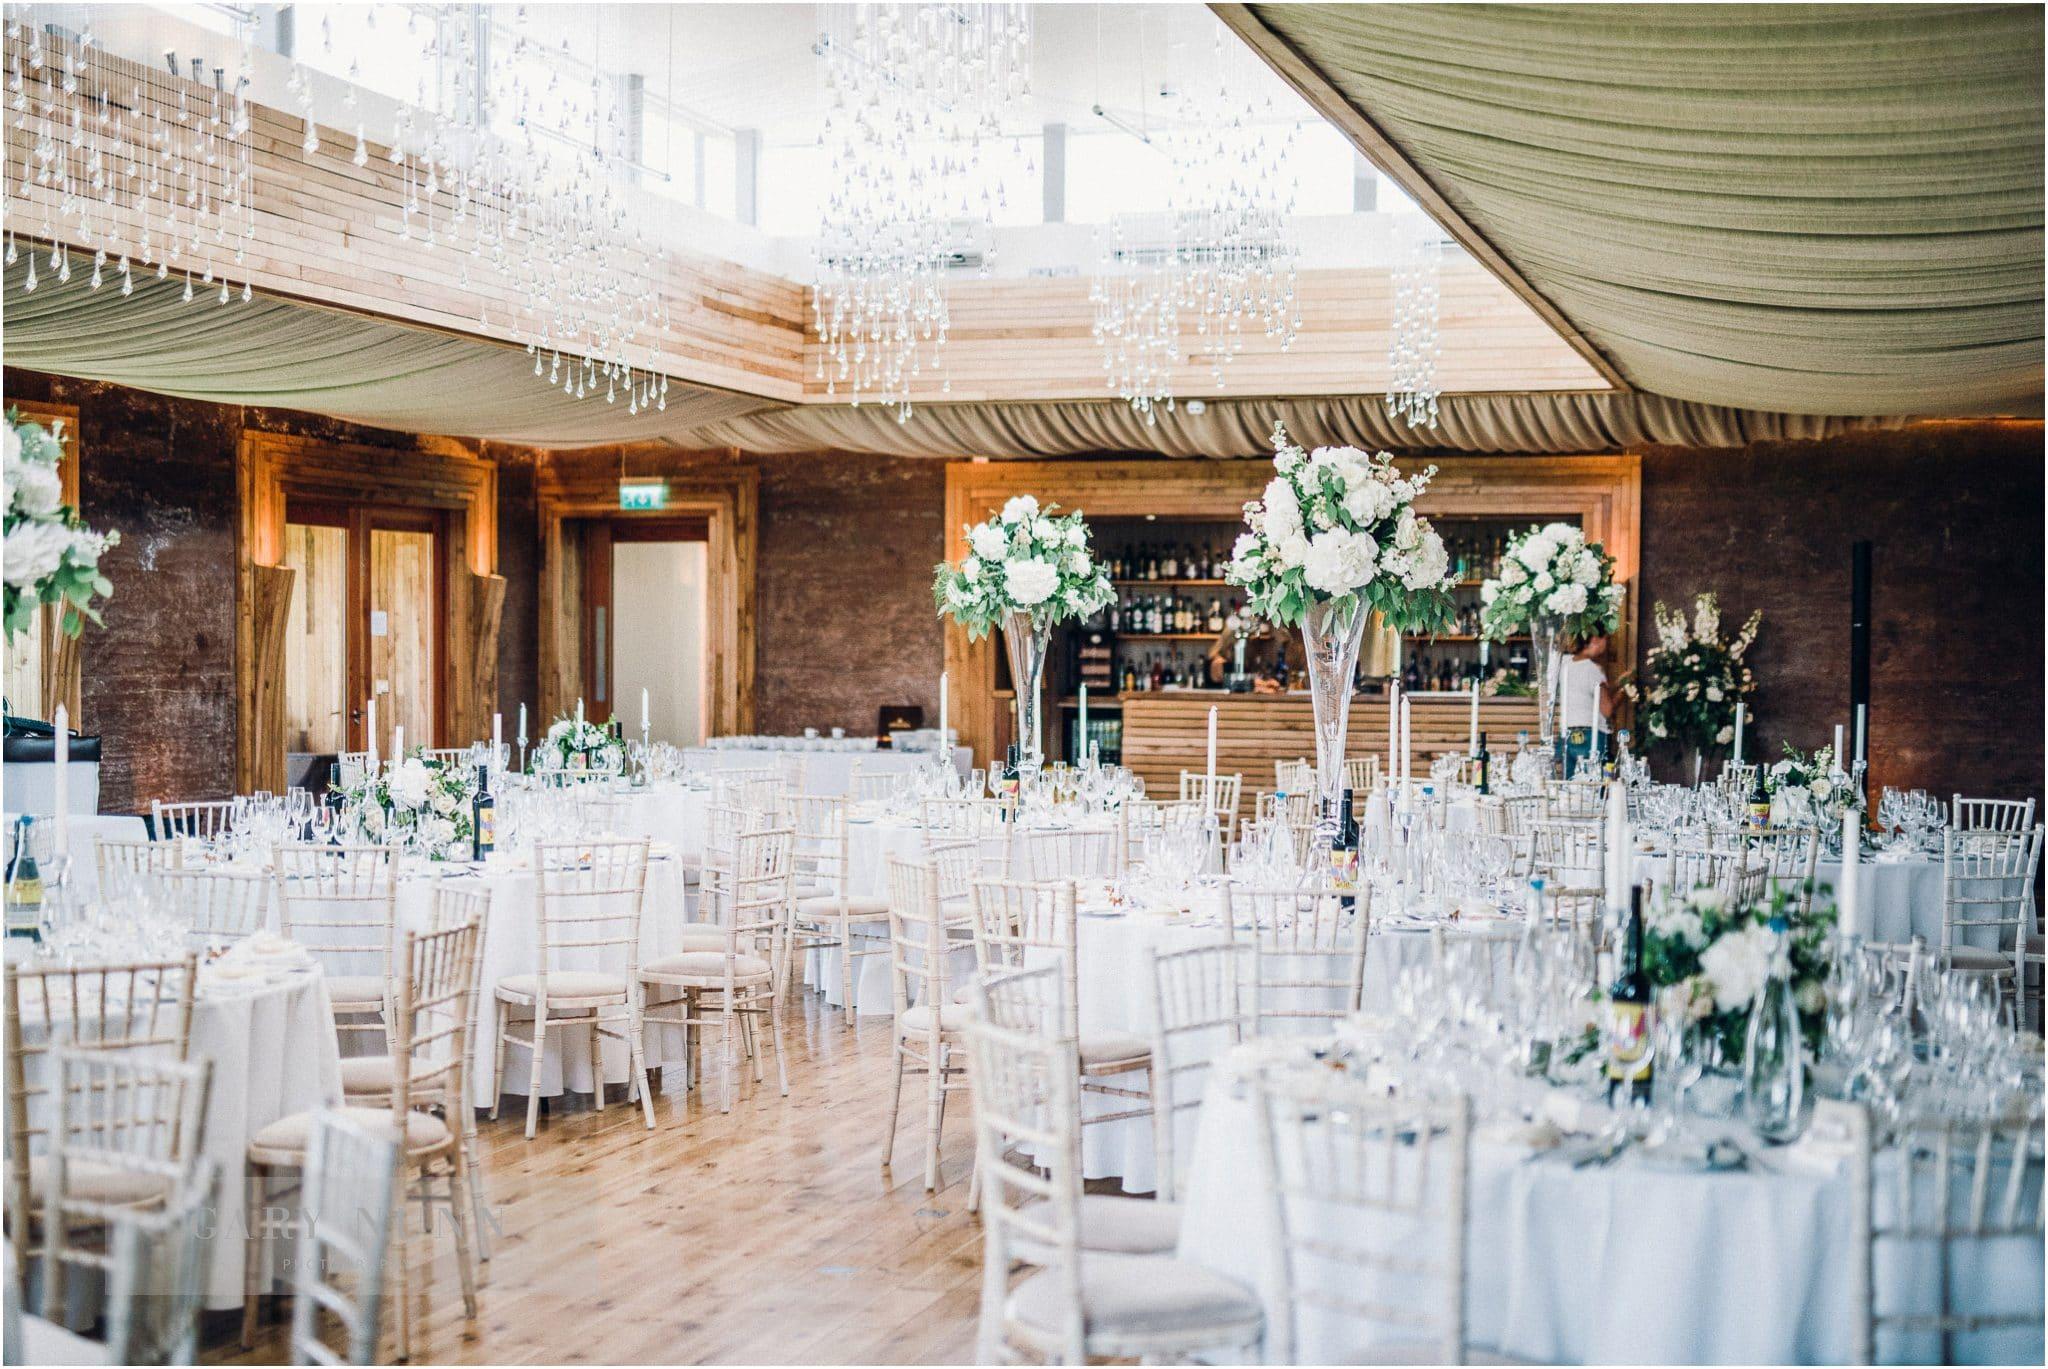 Elmore Court, wedding reception rammed earth, elmore court weddings, Destination Wedding Photographer, wedding photographer Milton Keynes, Elmore Court